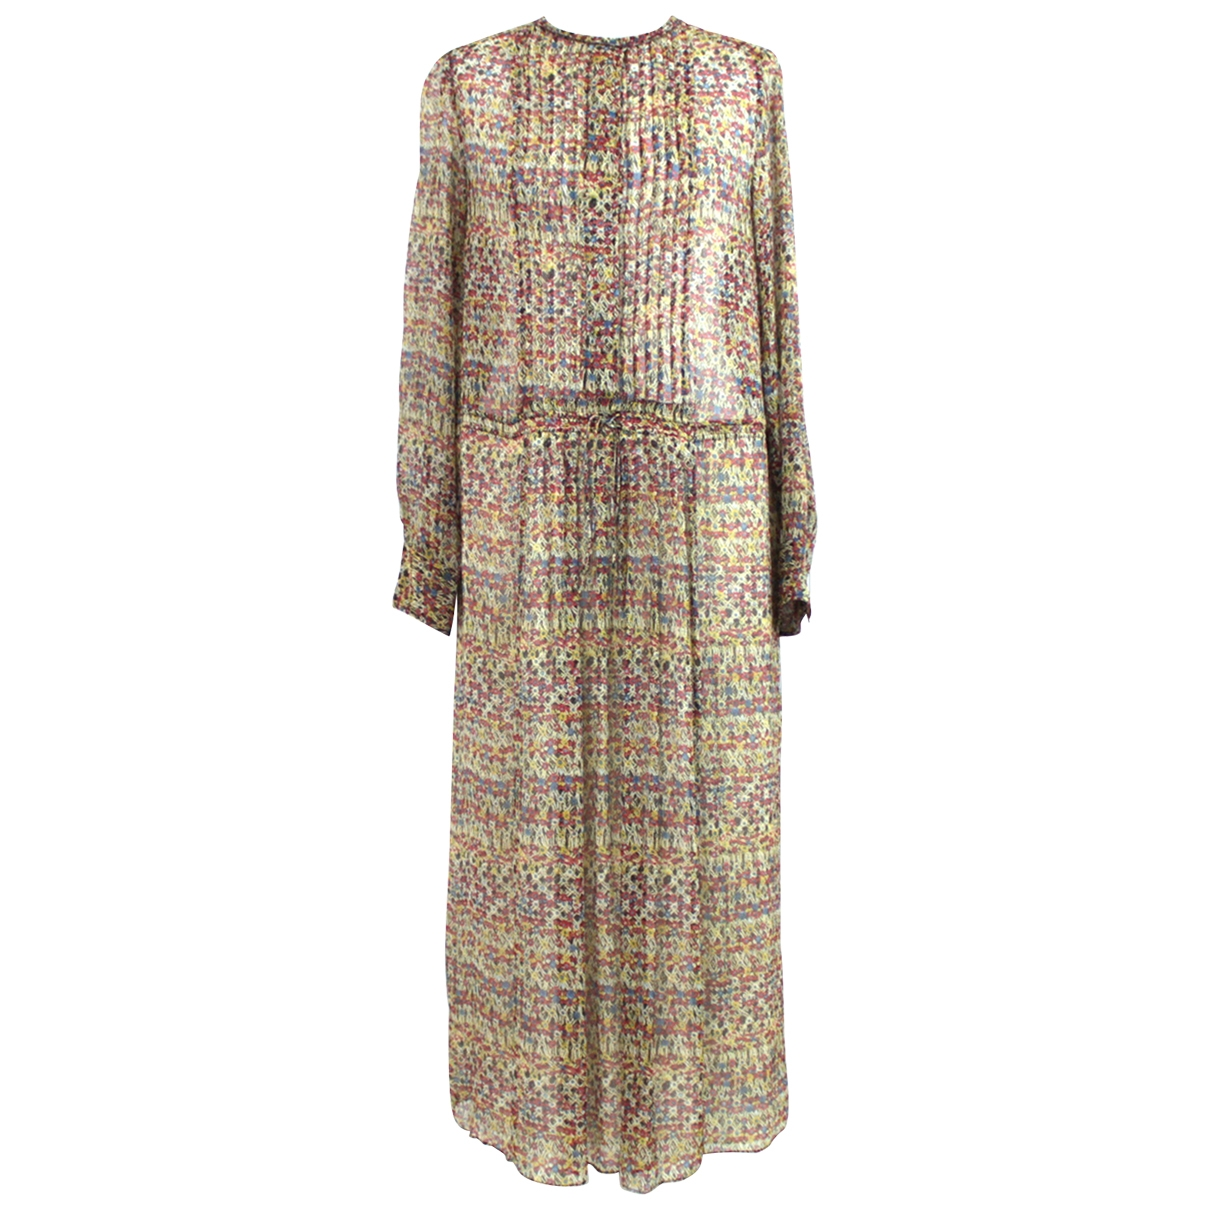 Isabel Marant Etoile \N Beige Silk dress for Women 34 FR